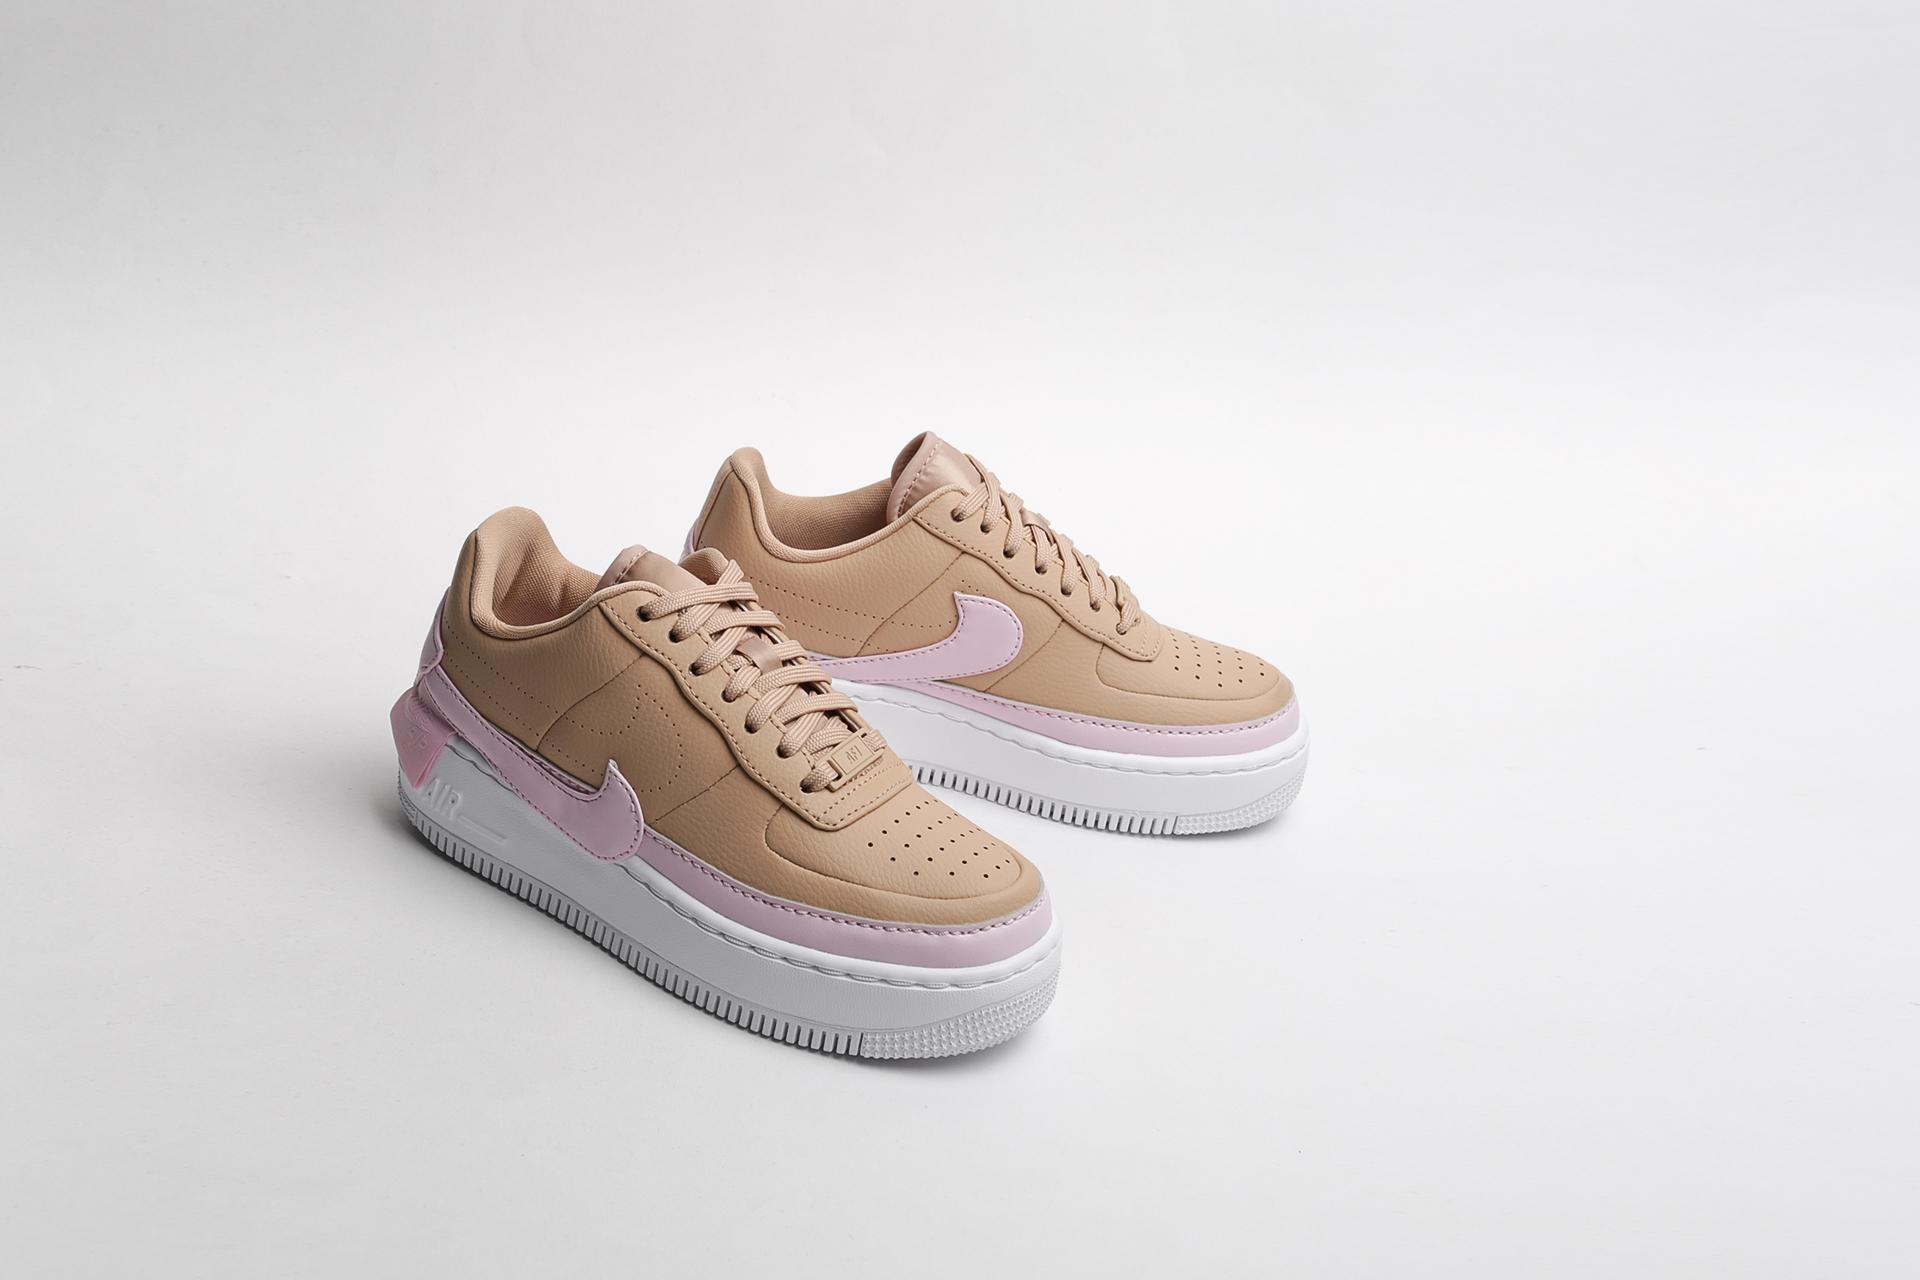 67b42a4f Купить бежевые женские кроссовки WMNS Air Force 1 Jester XX от Nike ...